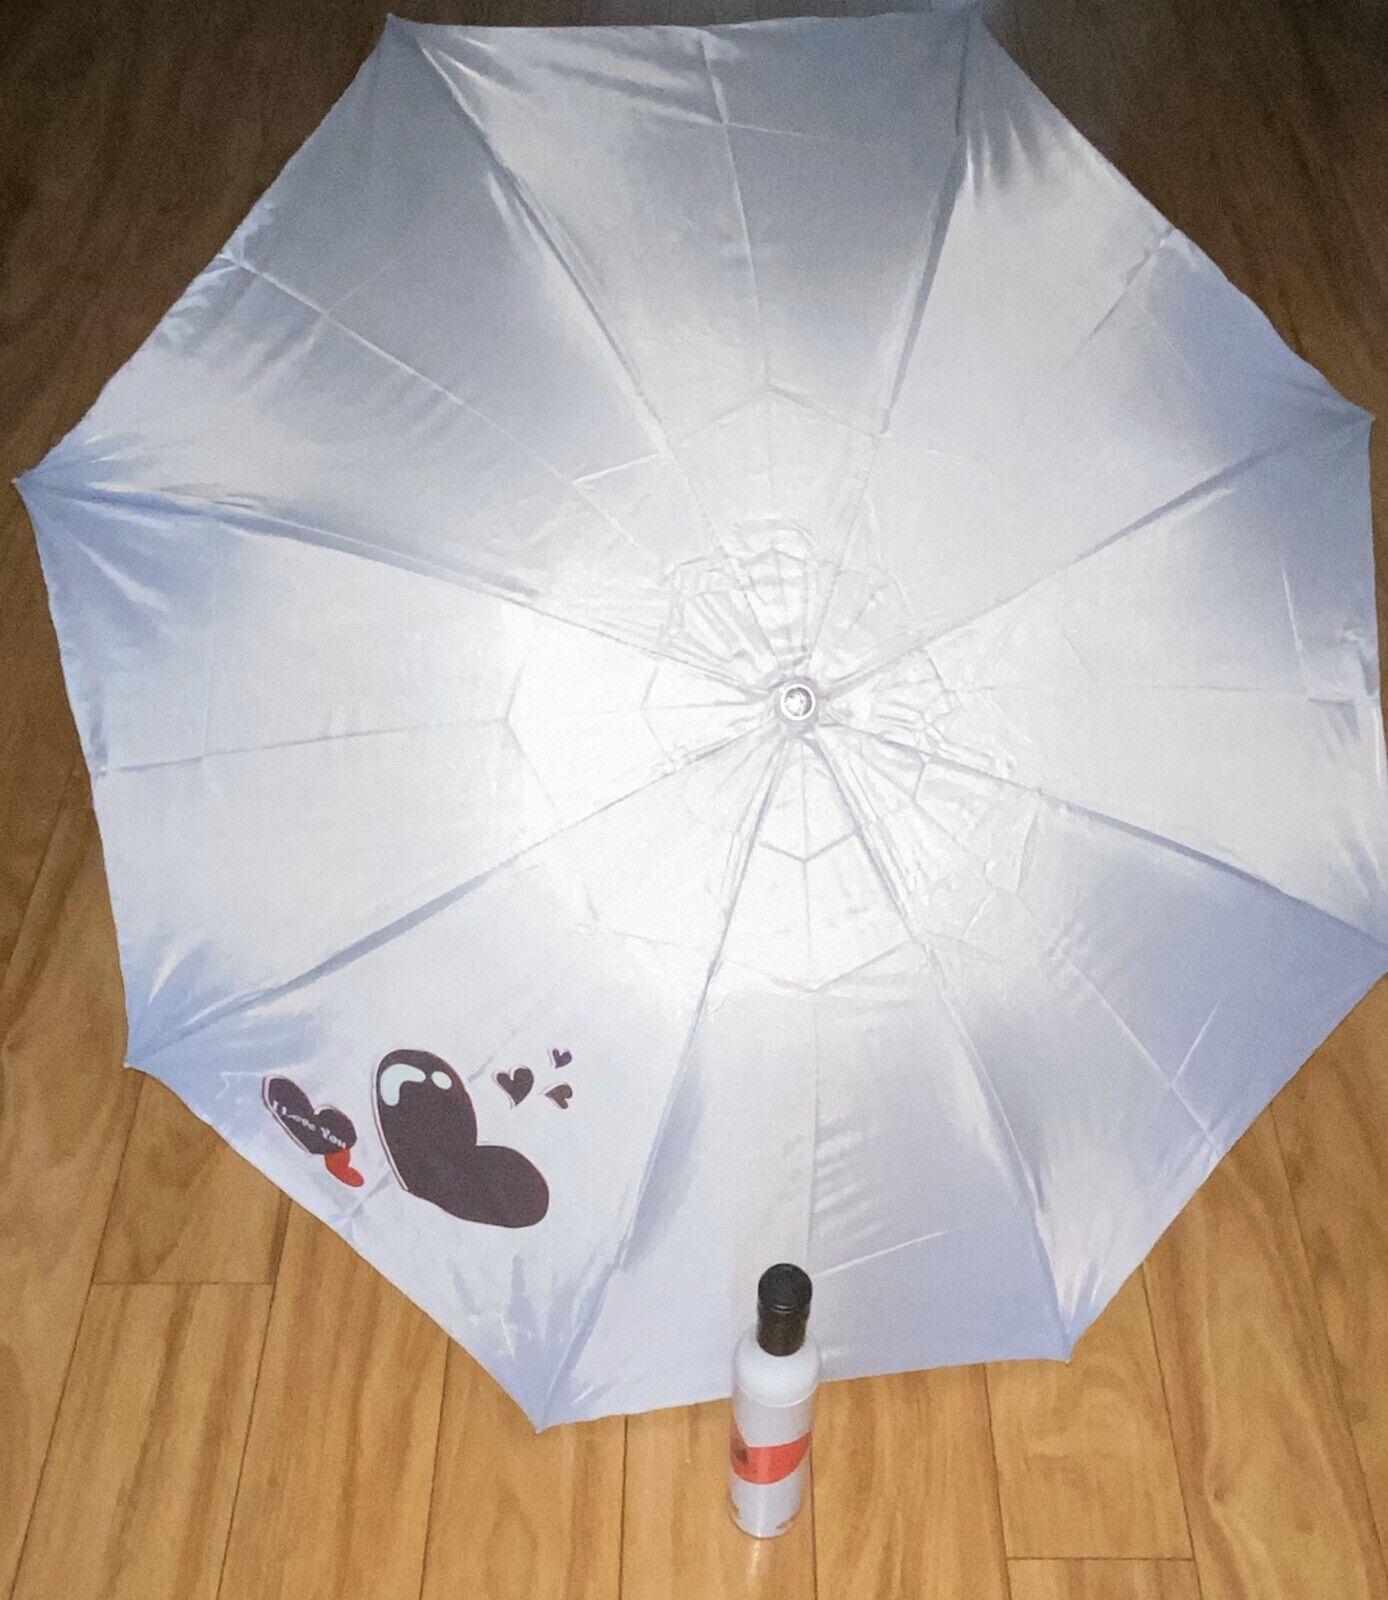 Wine Bottle Umbrella White & Red Heart Bottle Black Top Umbrella